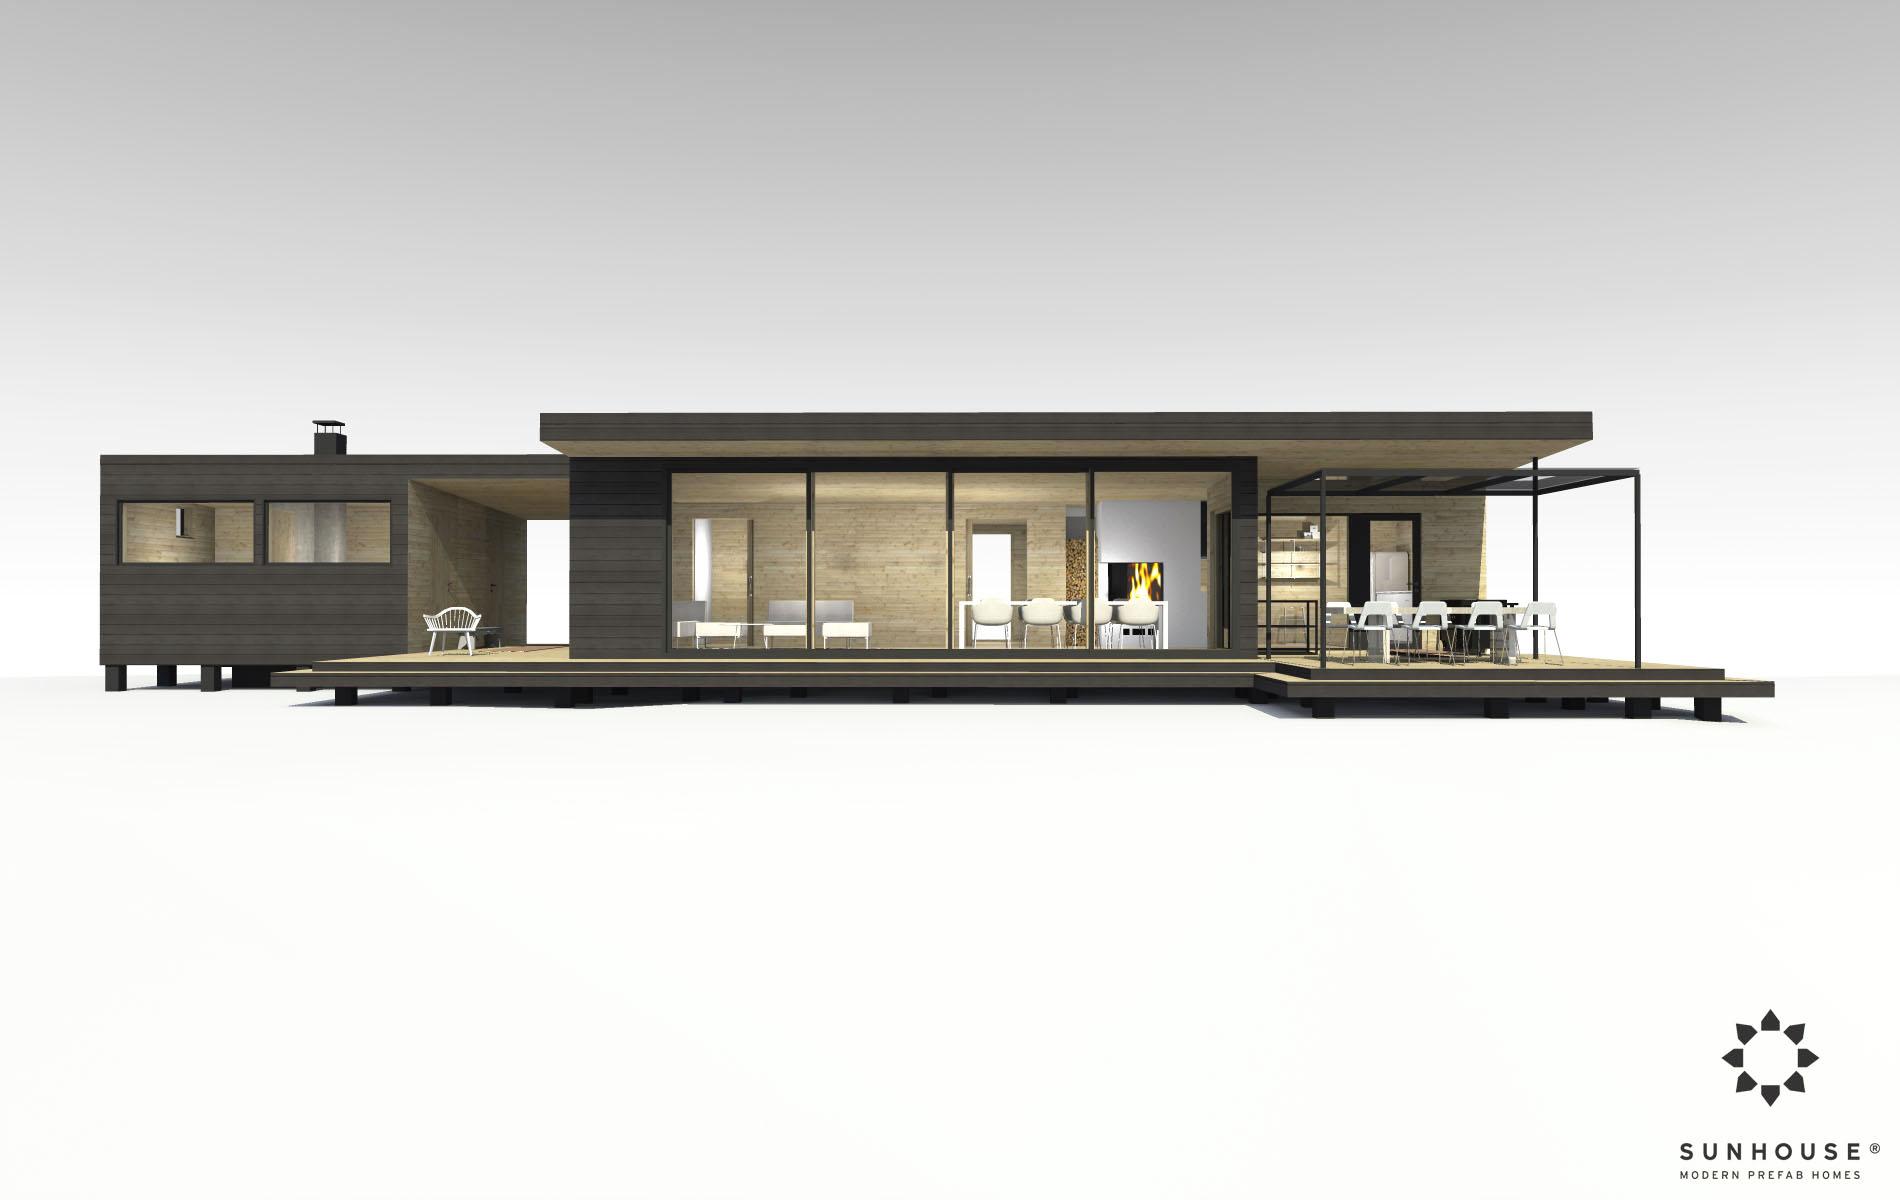 Sunhouse moderni huvila S1419_ulkoa (6)